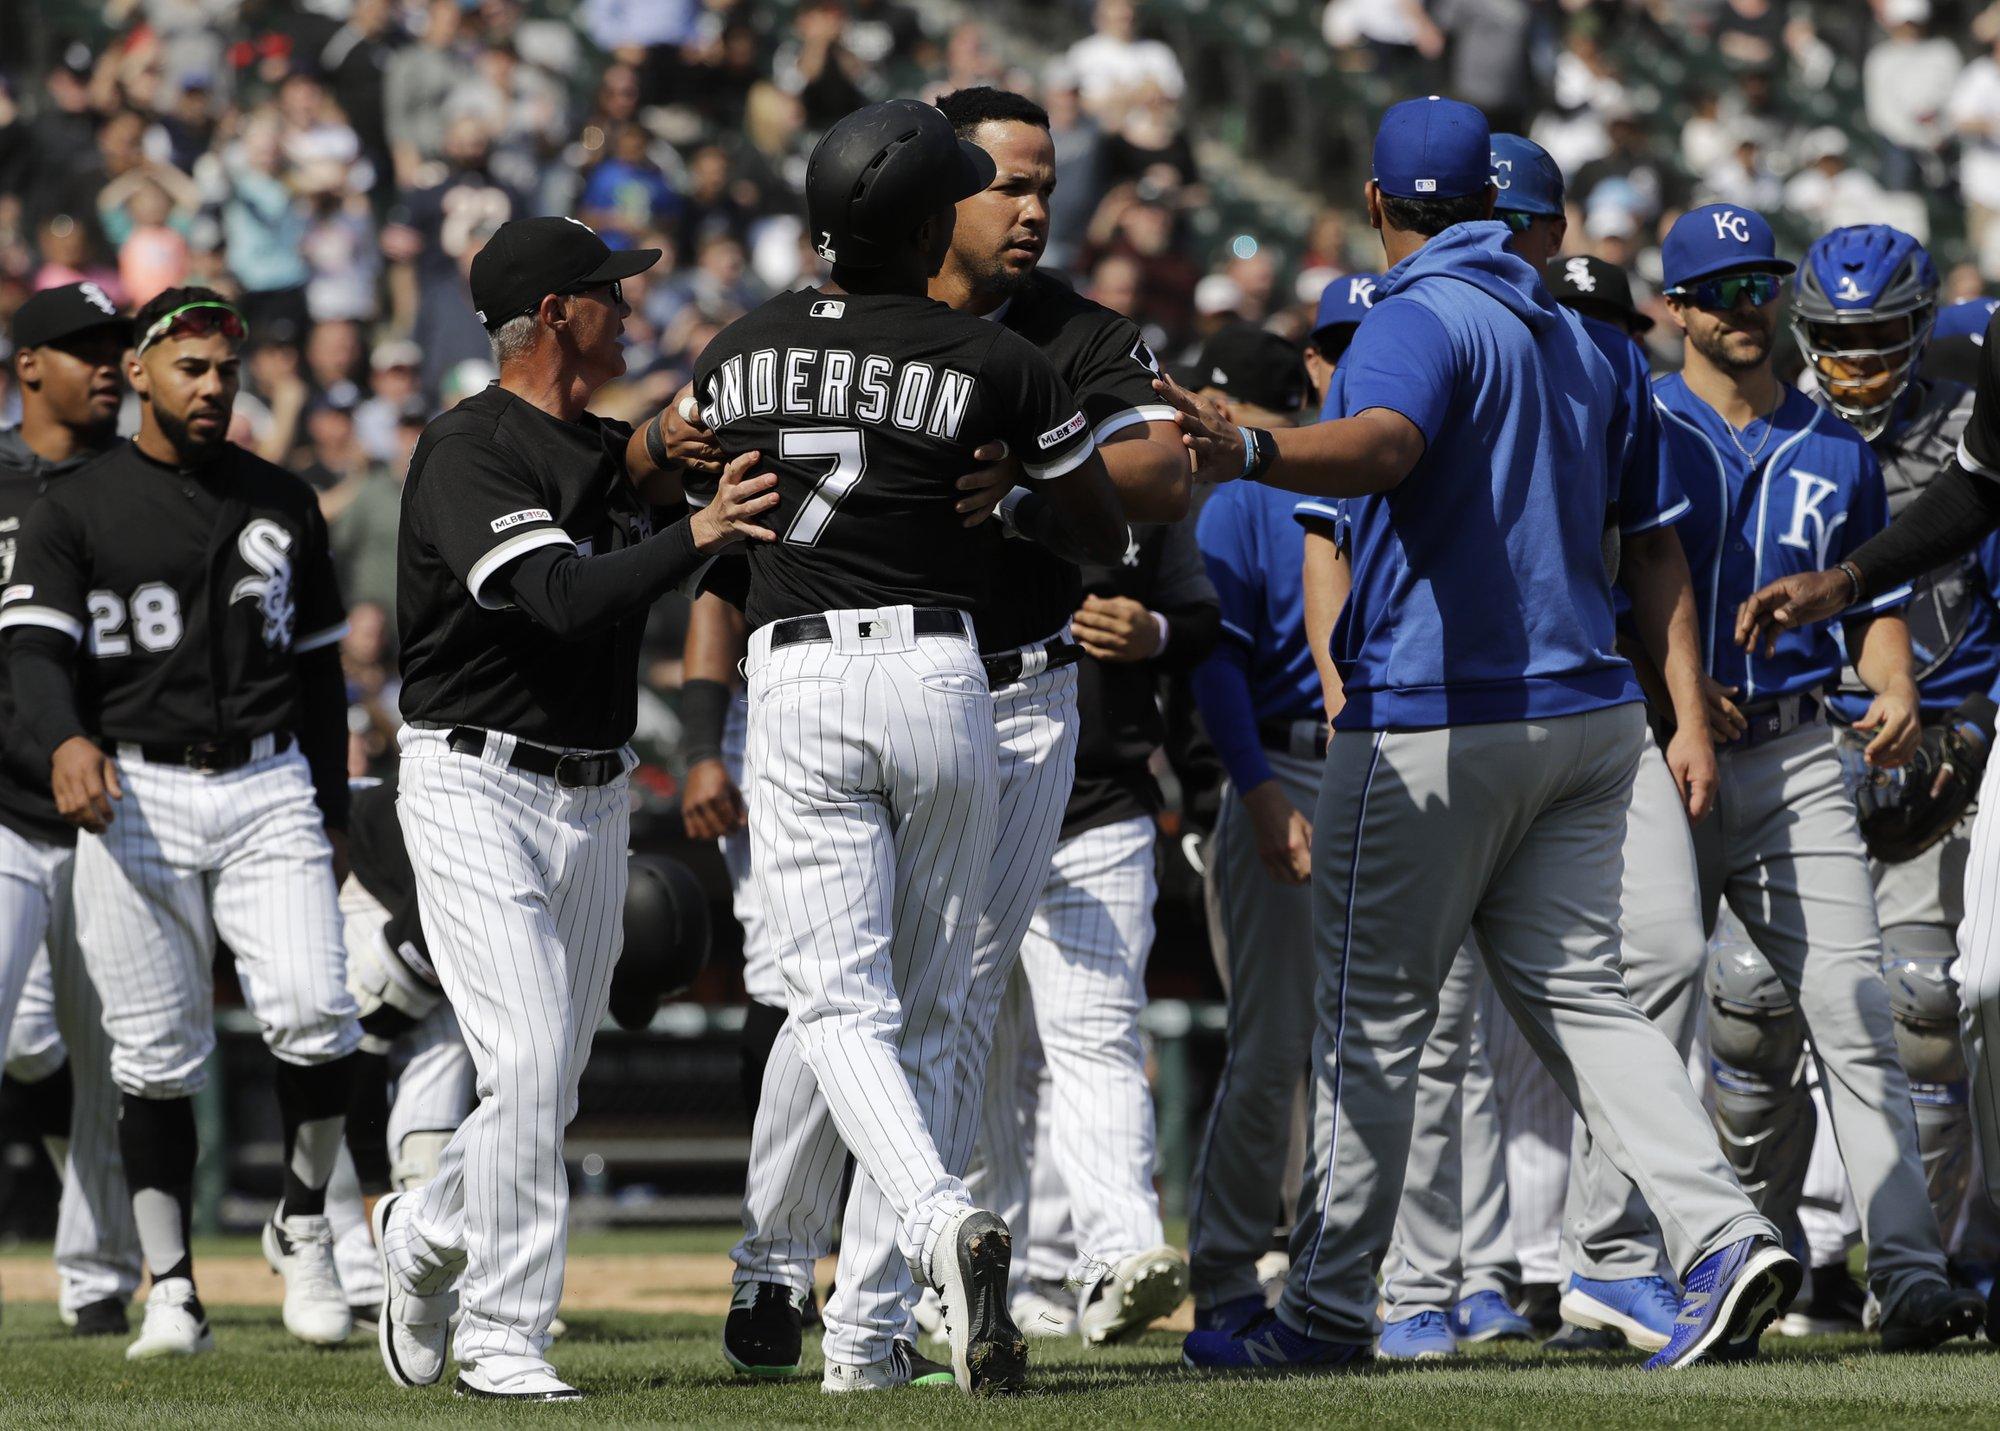 Amid plunking debate, MLB's marketing is all-in on bat flips